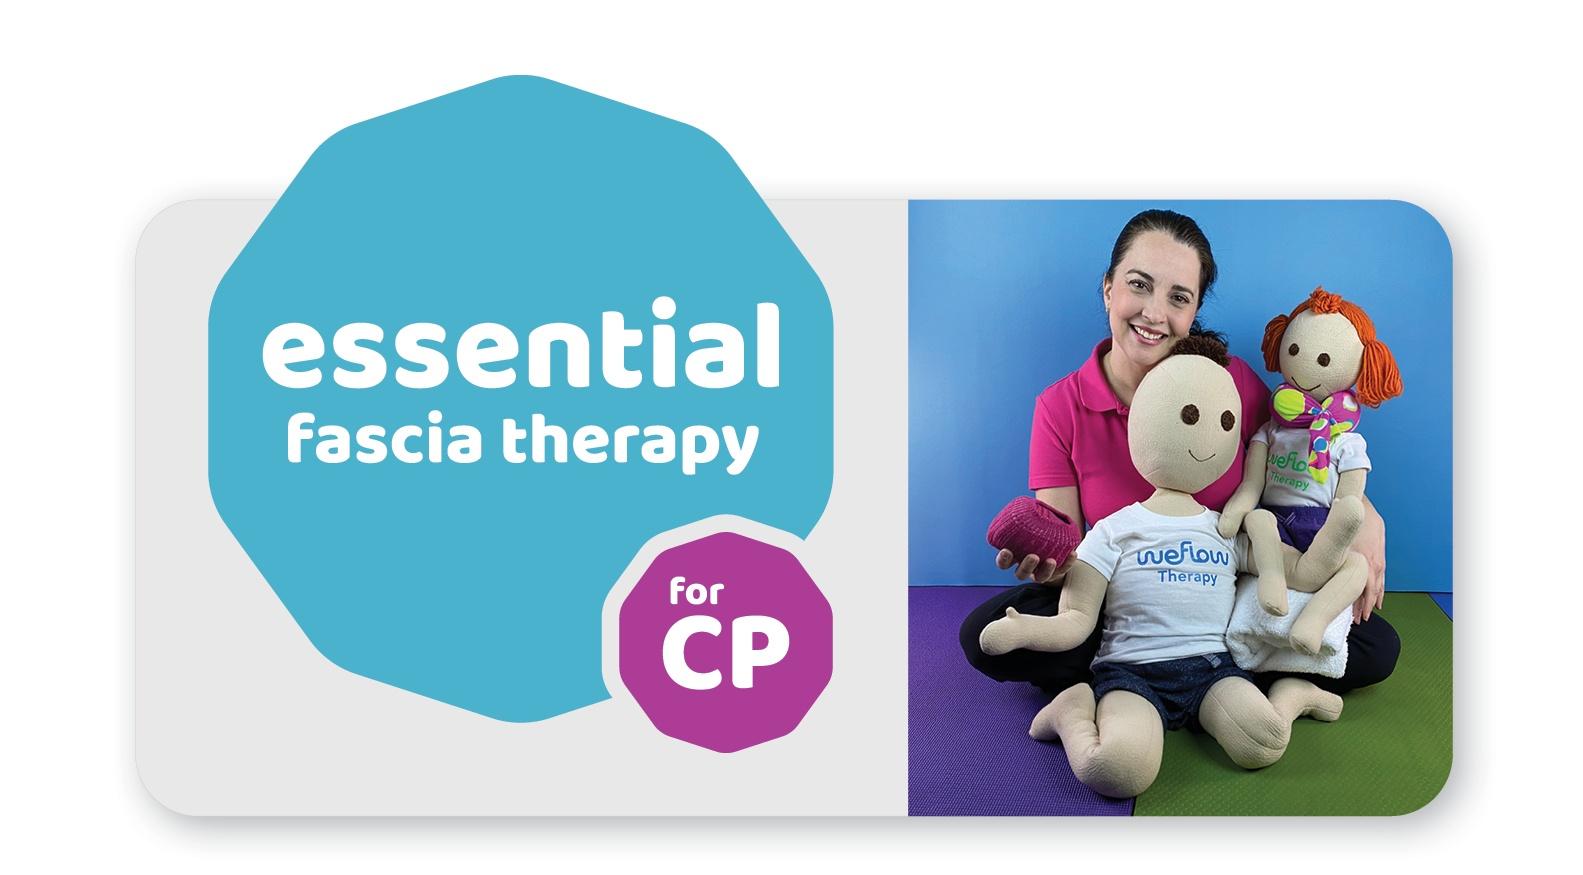 Essential Fascia Therapy for Cerebral Palsy